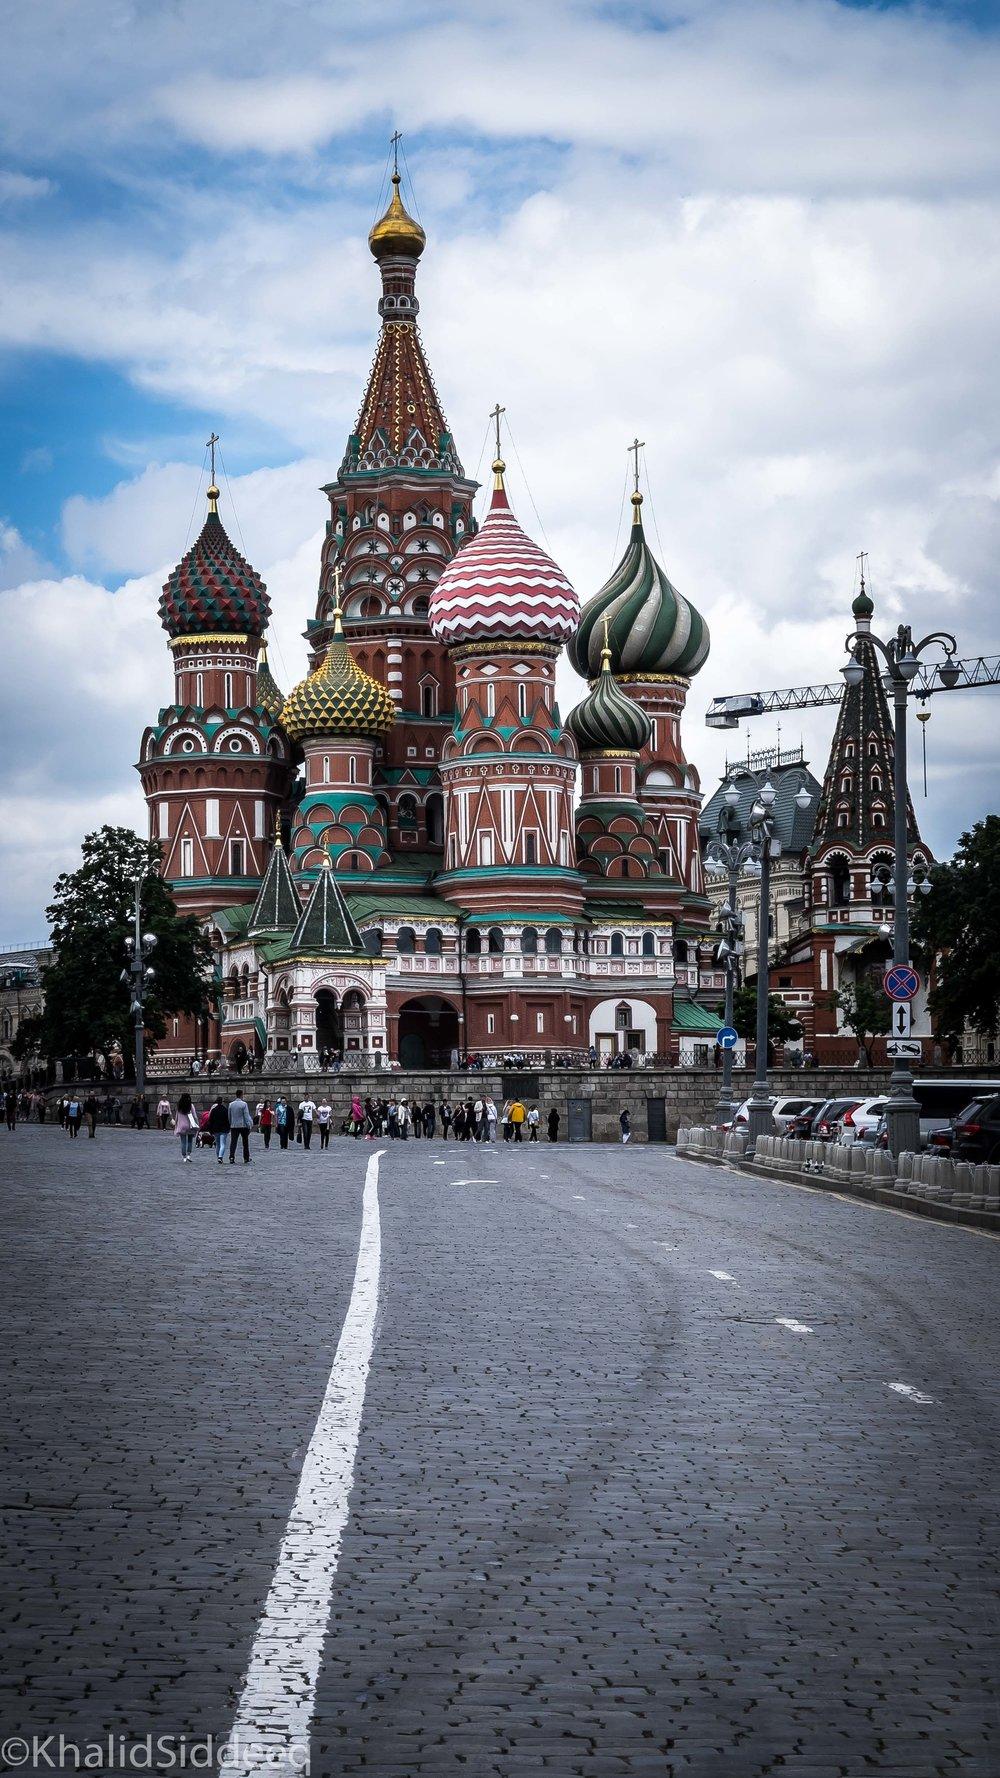 كنيسة سانت باسيل، موسكو، روسيا